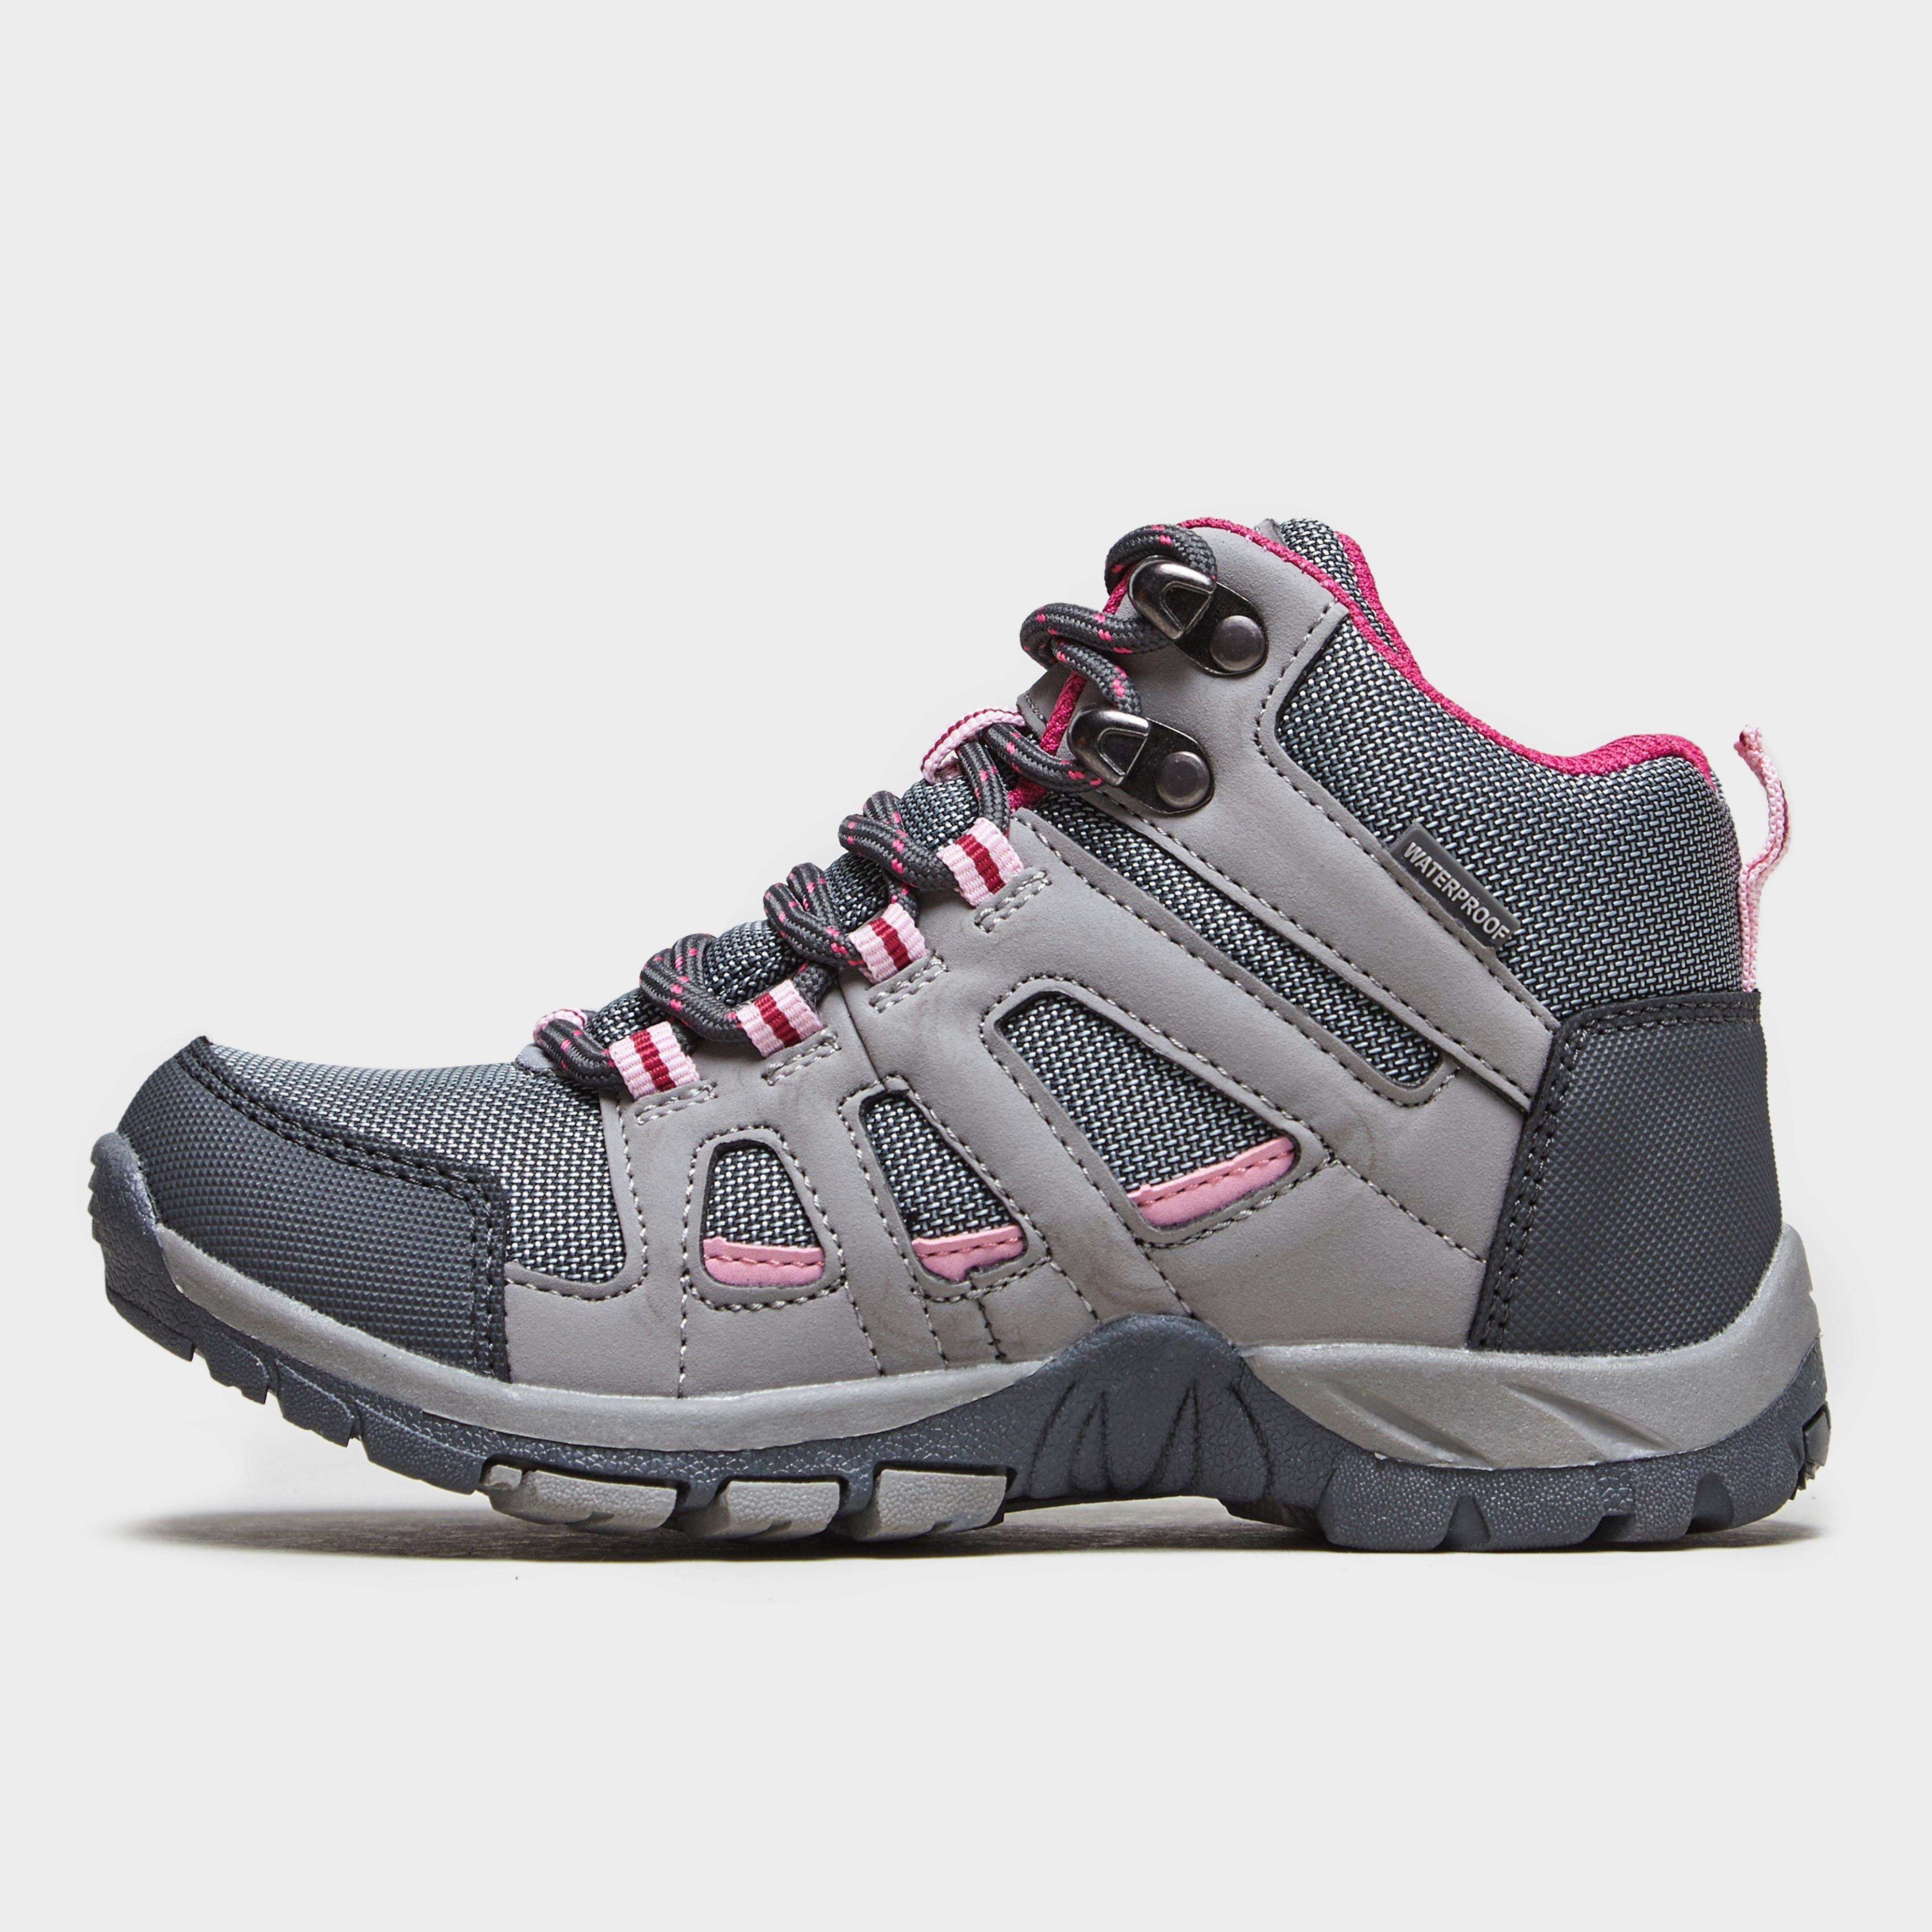 PETER STORM Girls' Headley Waterproof Mid Walking Boot